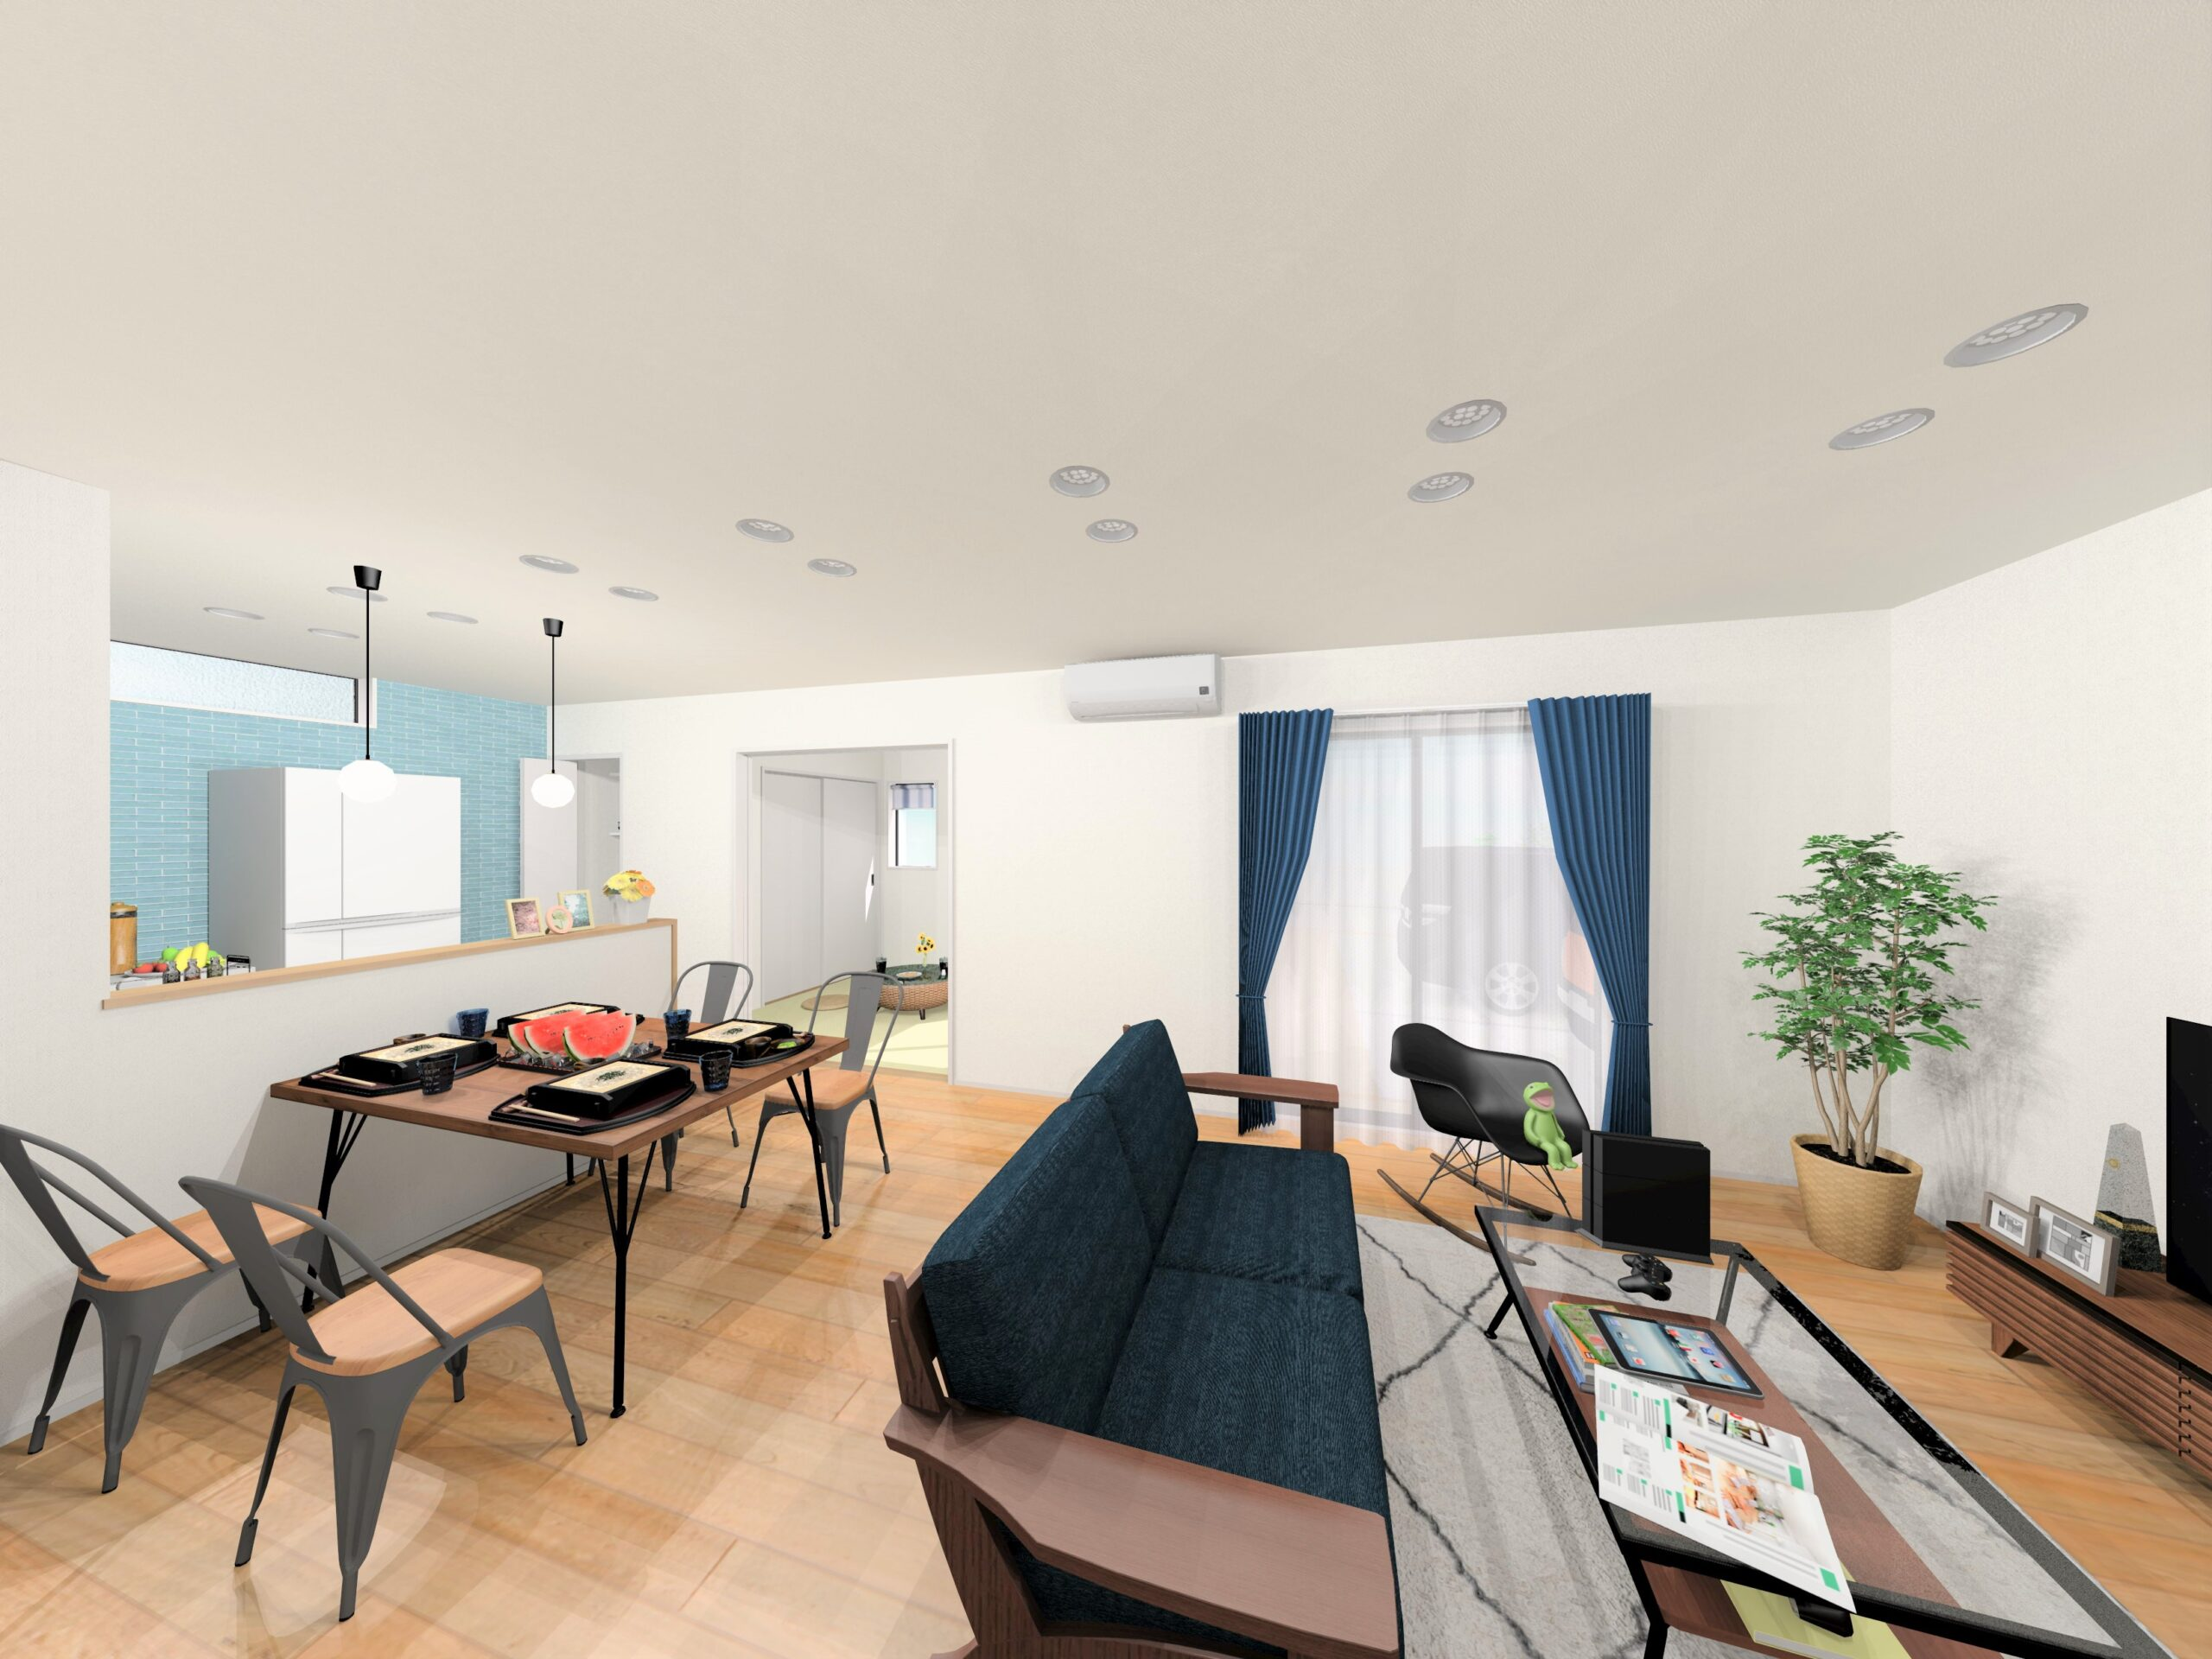 嬉野市新築建売住宅【OURS下宿】5号地LDKパース